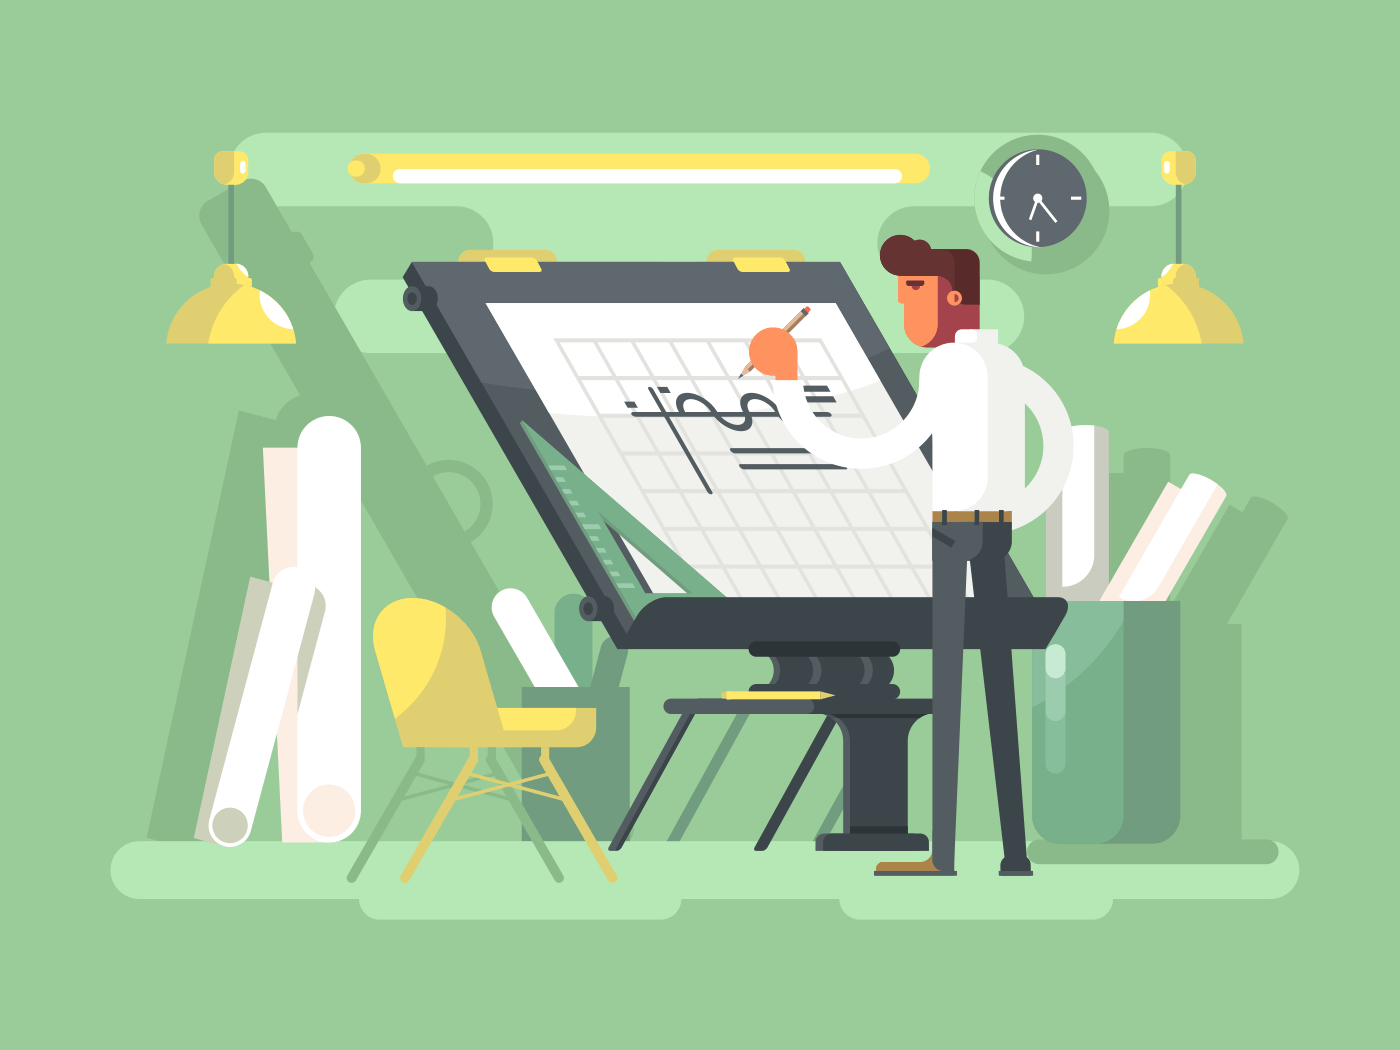 Engineer project draws flat vector illustration